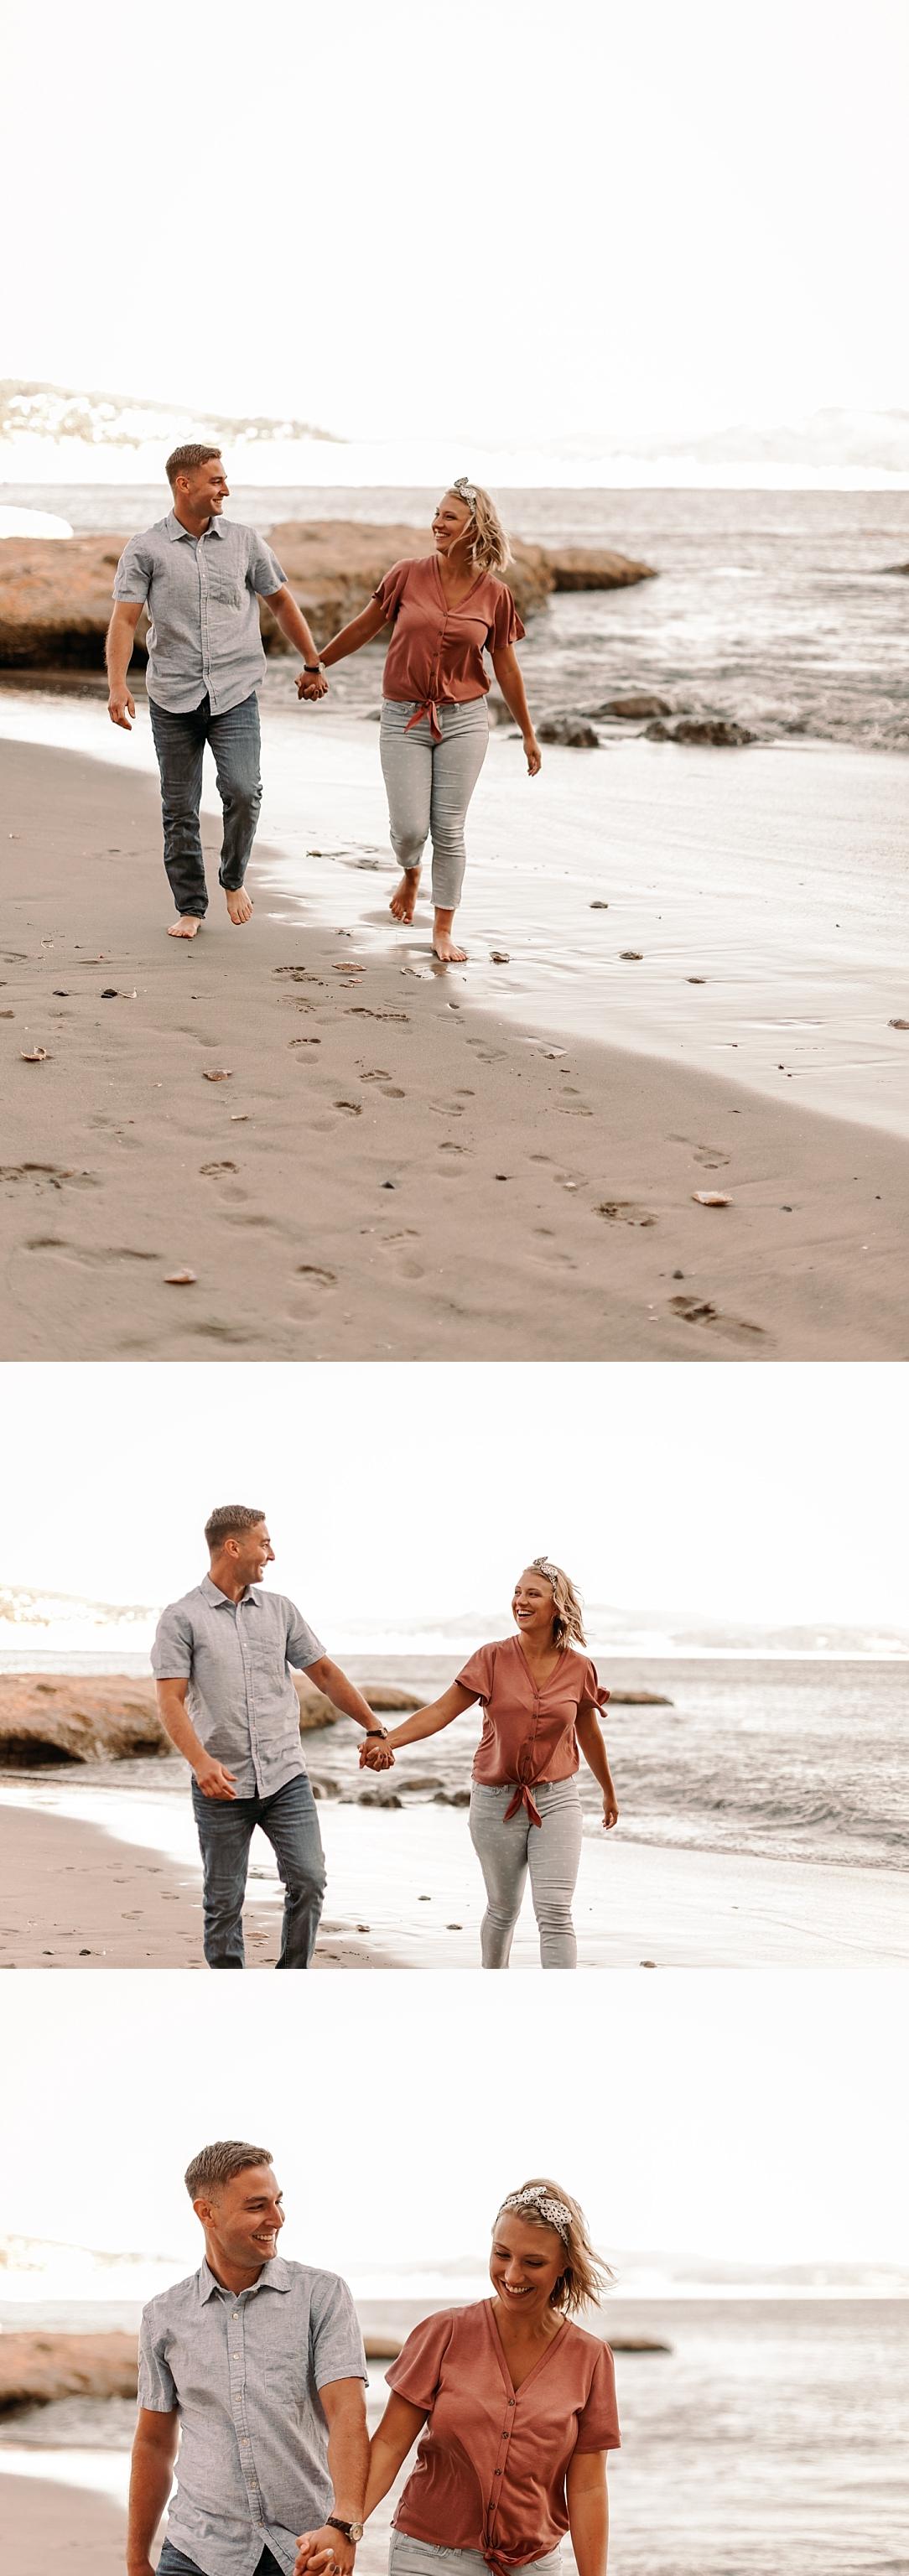 playful summer couple beach session_0003.jpg